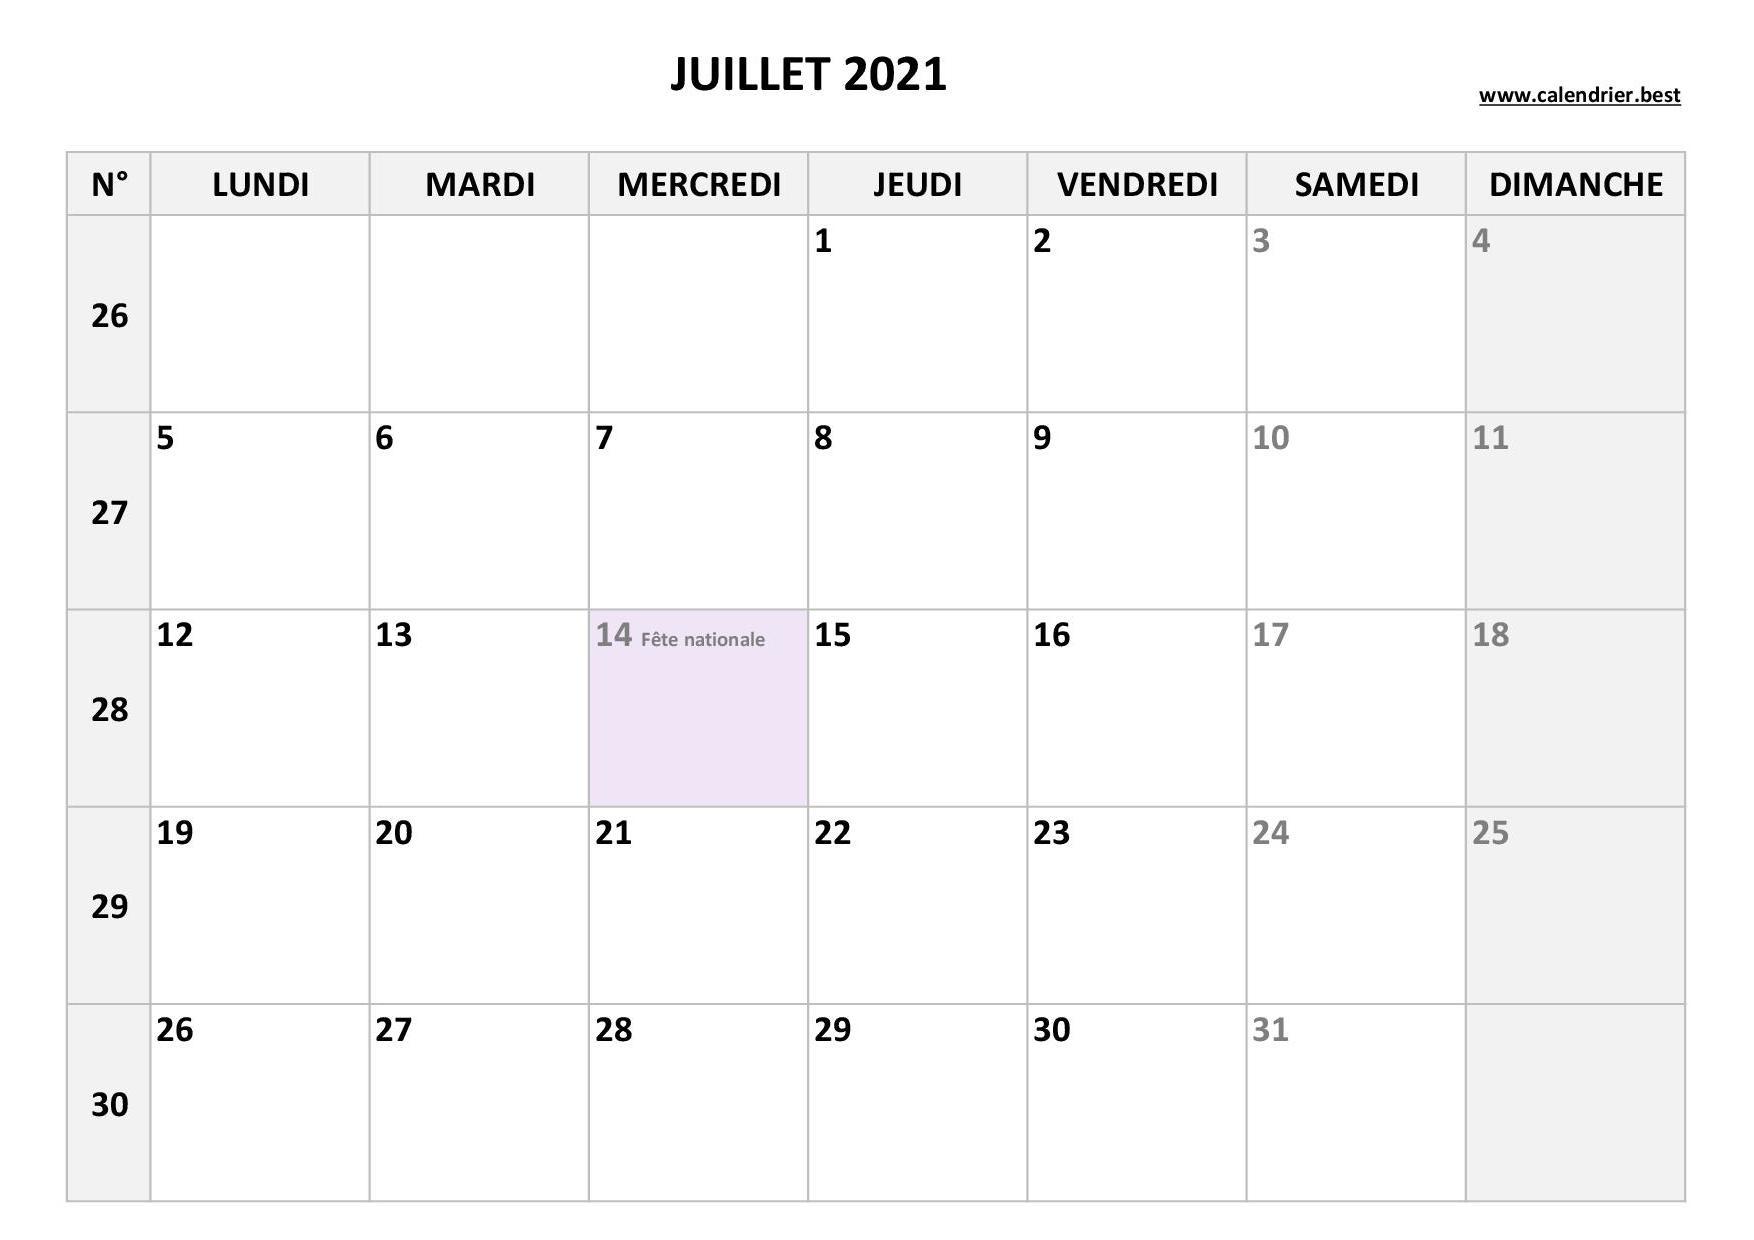 Calendrier Juillet 2021 à consulter ou imprimer  Calendrier.best